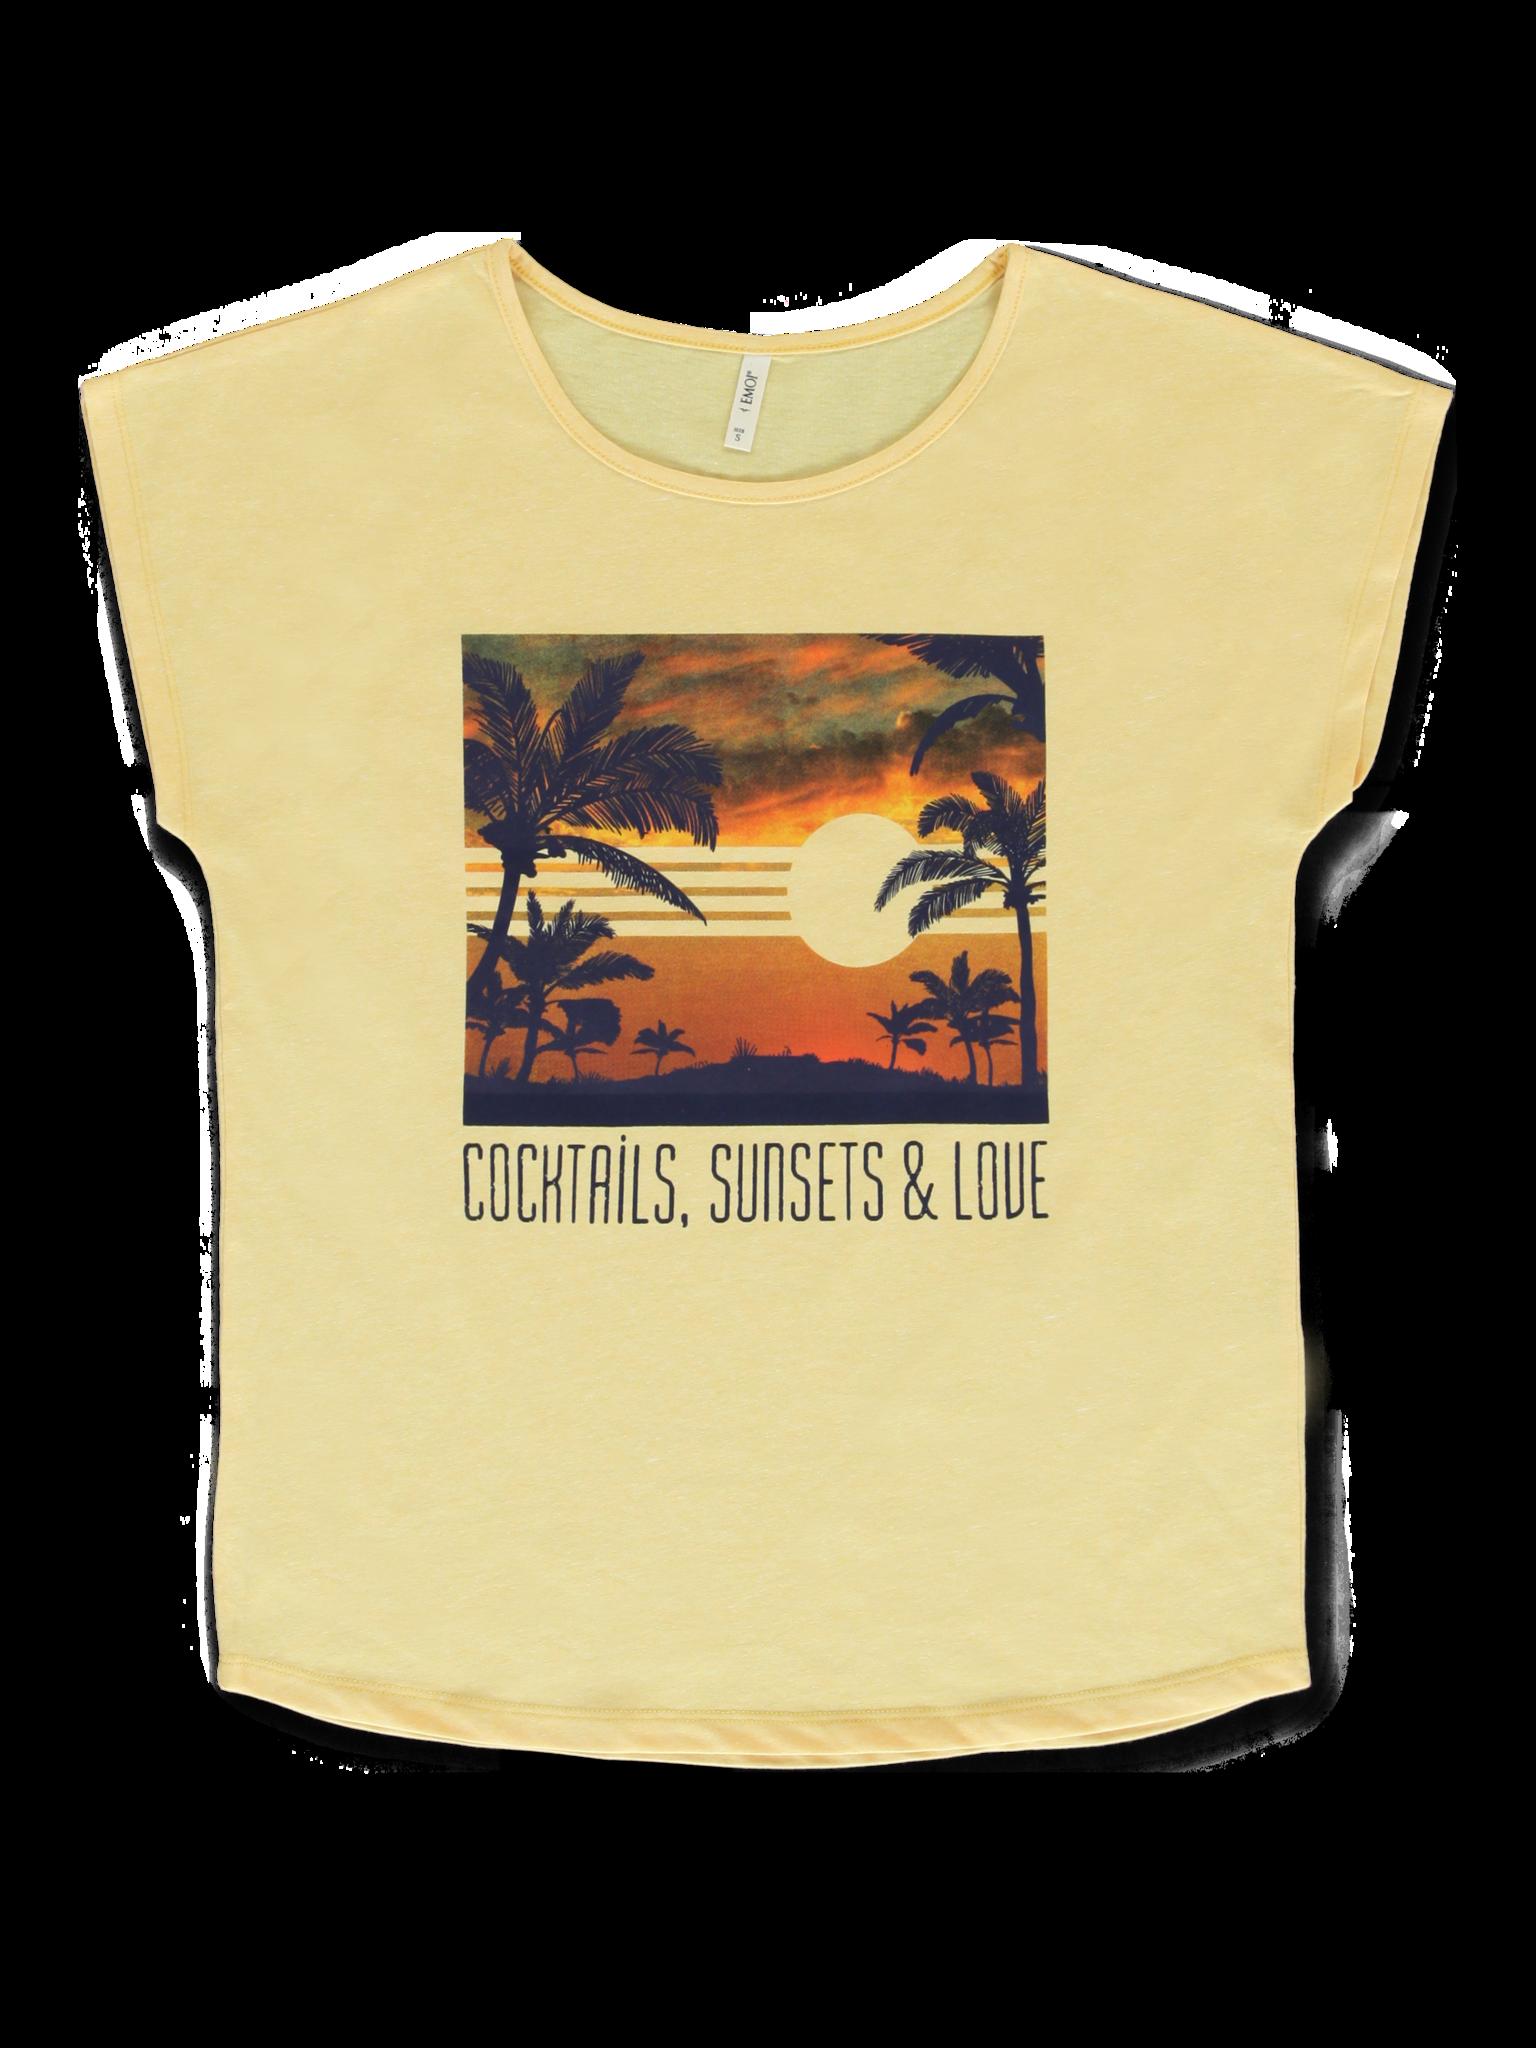 All Brands   Summerproducts Ladies   T-shirt   24 pcs/box